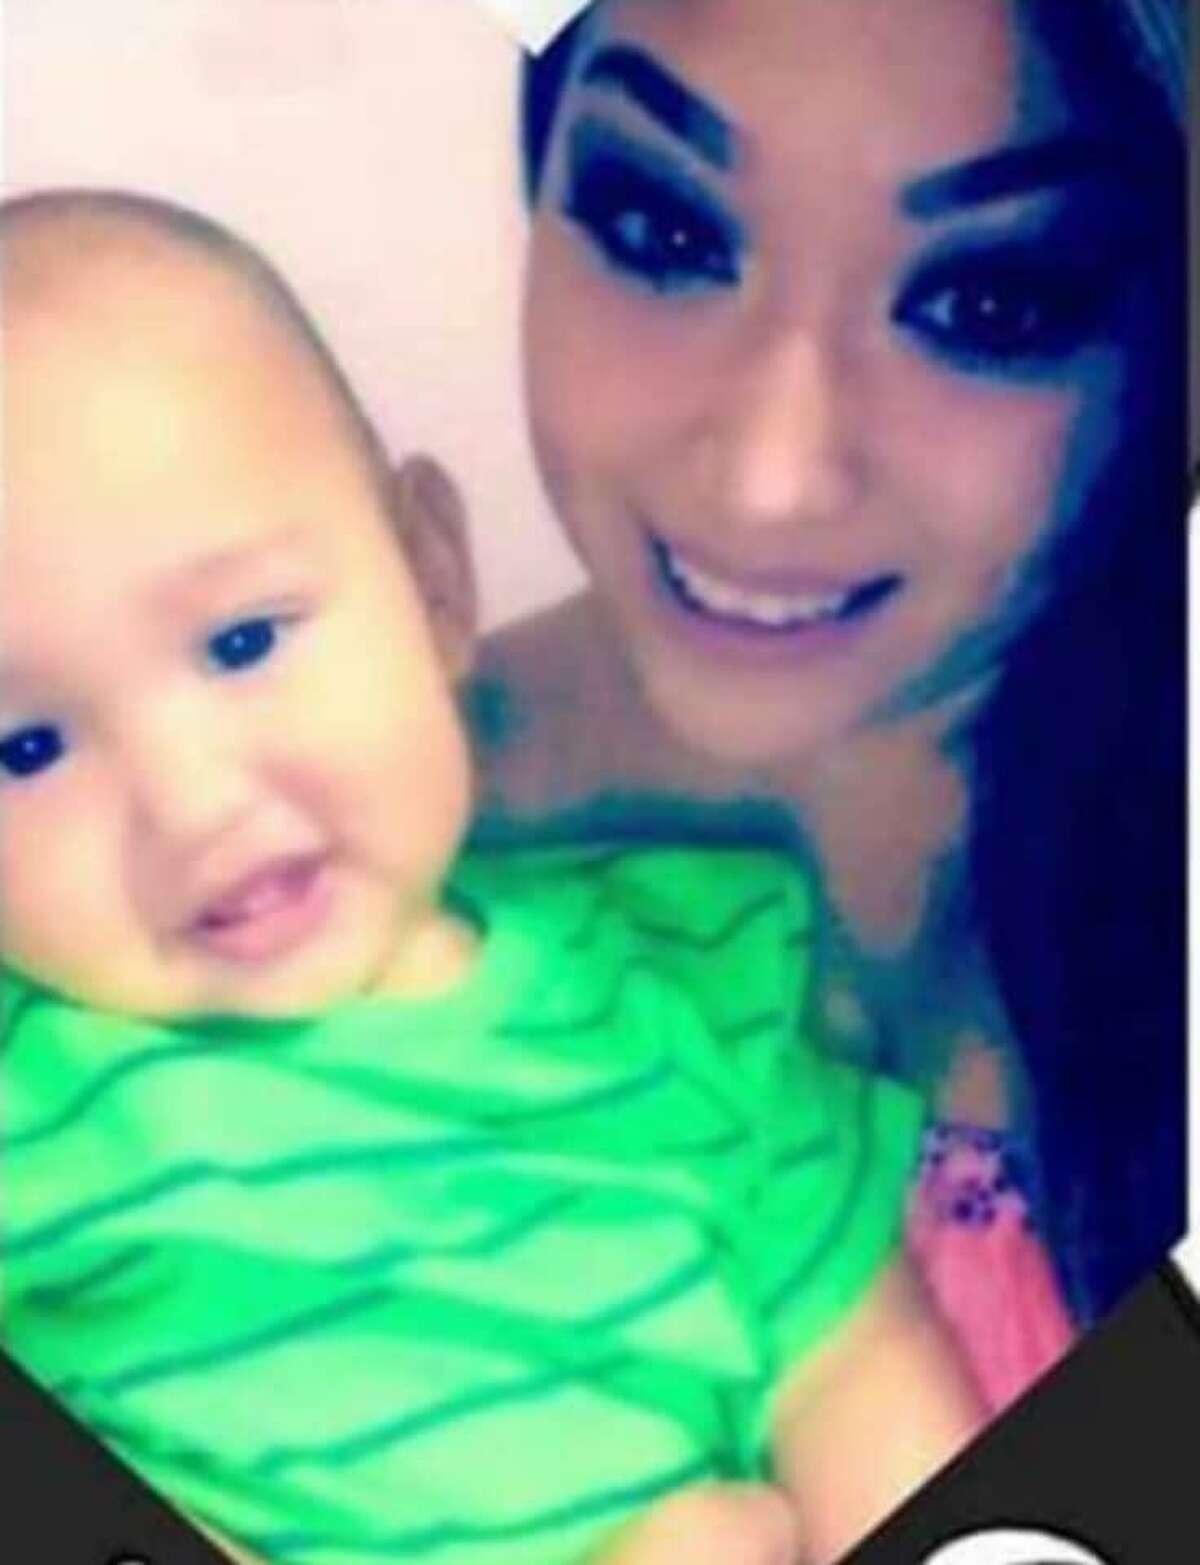 Grizelda Hernandez is shown with her son, Dominick.